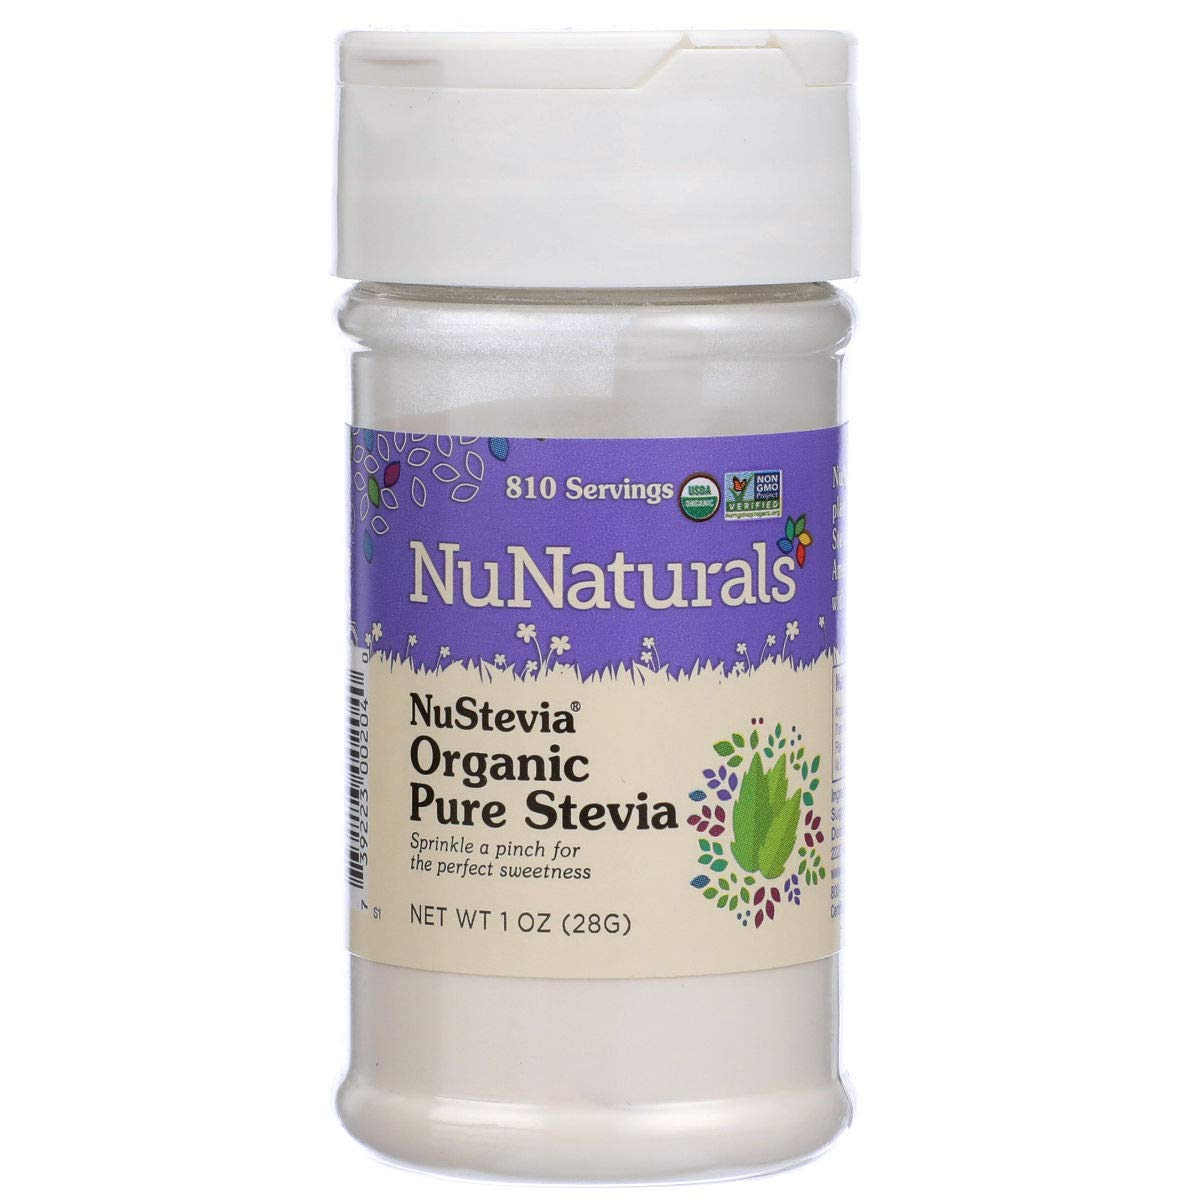 NuNaturals NuStevia Organic Pure Stevia All Natural Sweetener, 1 Ounce